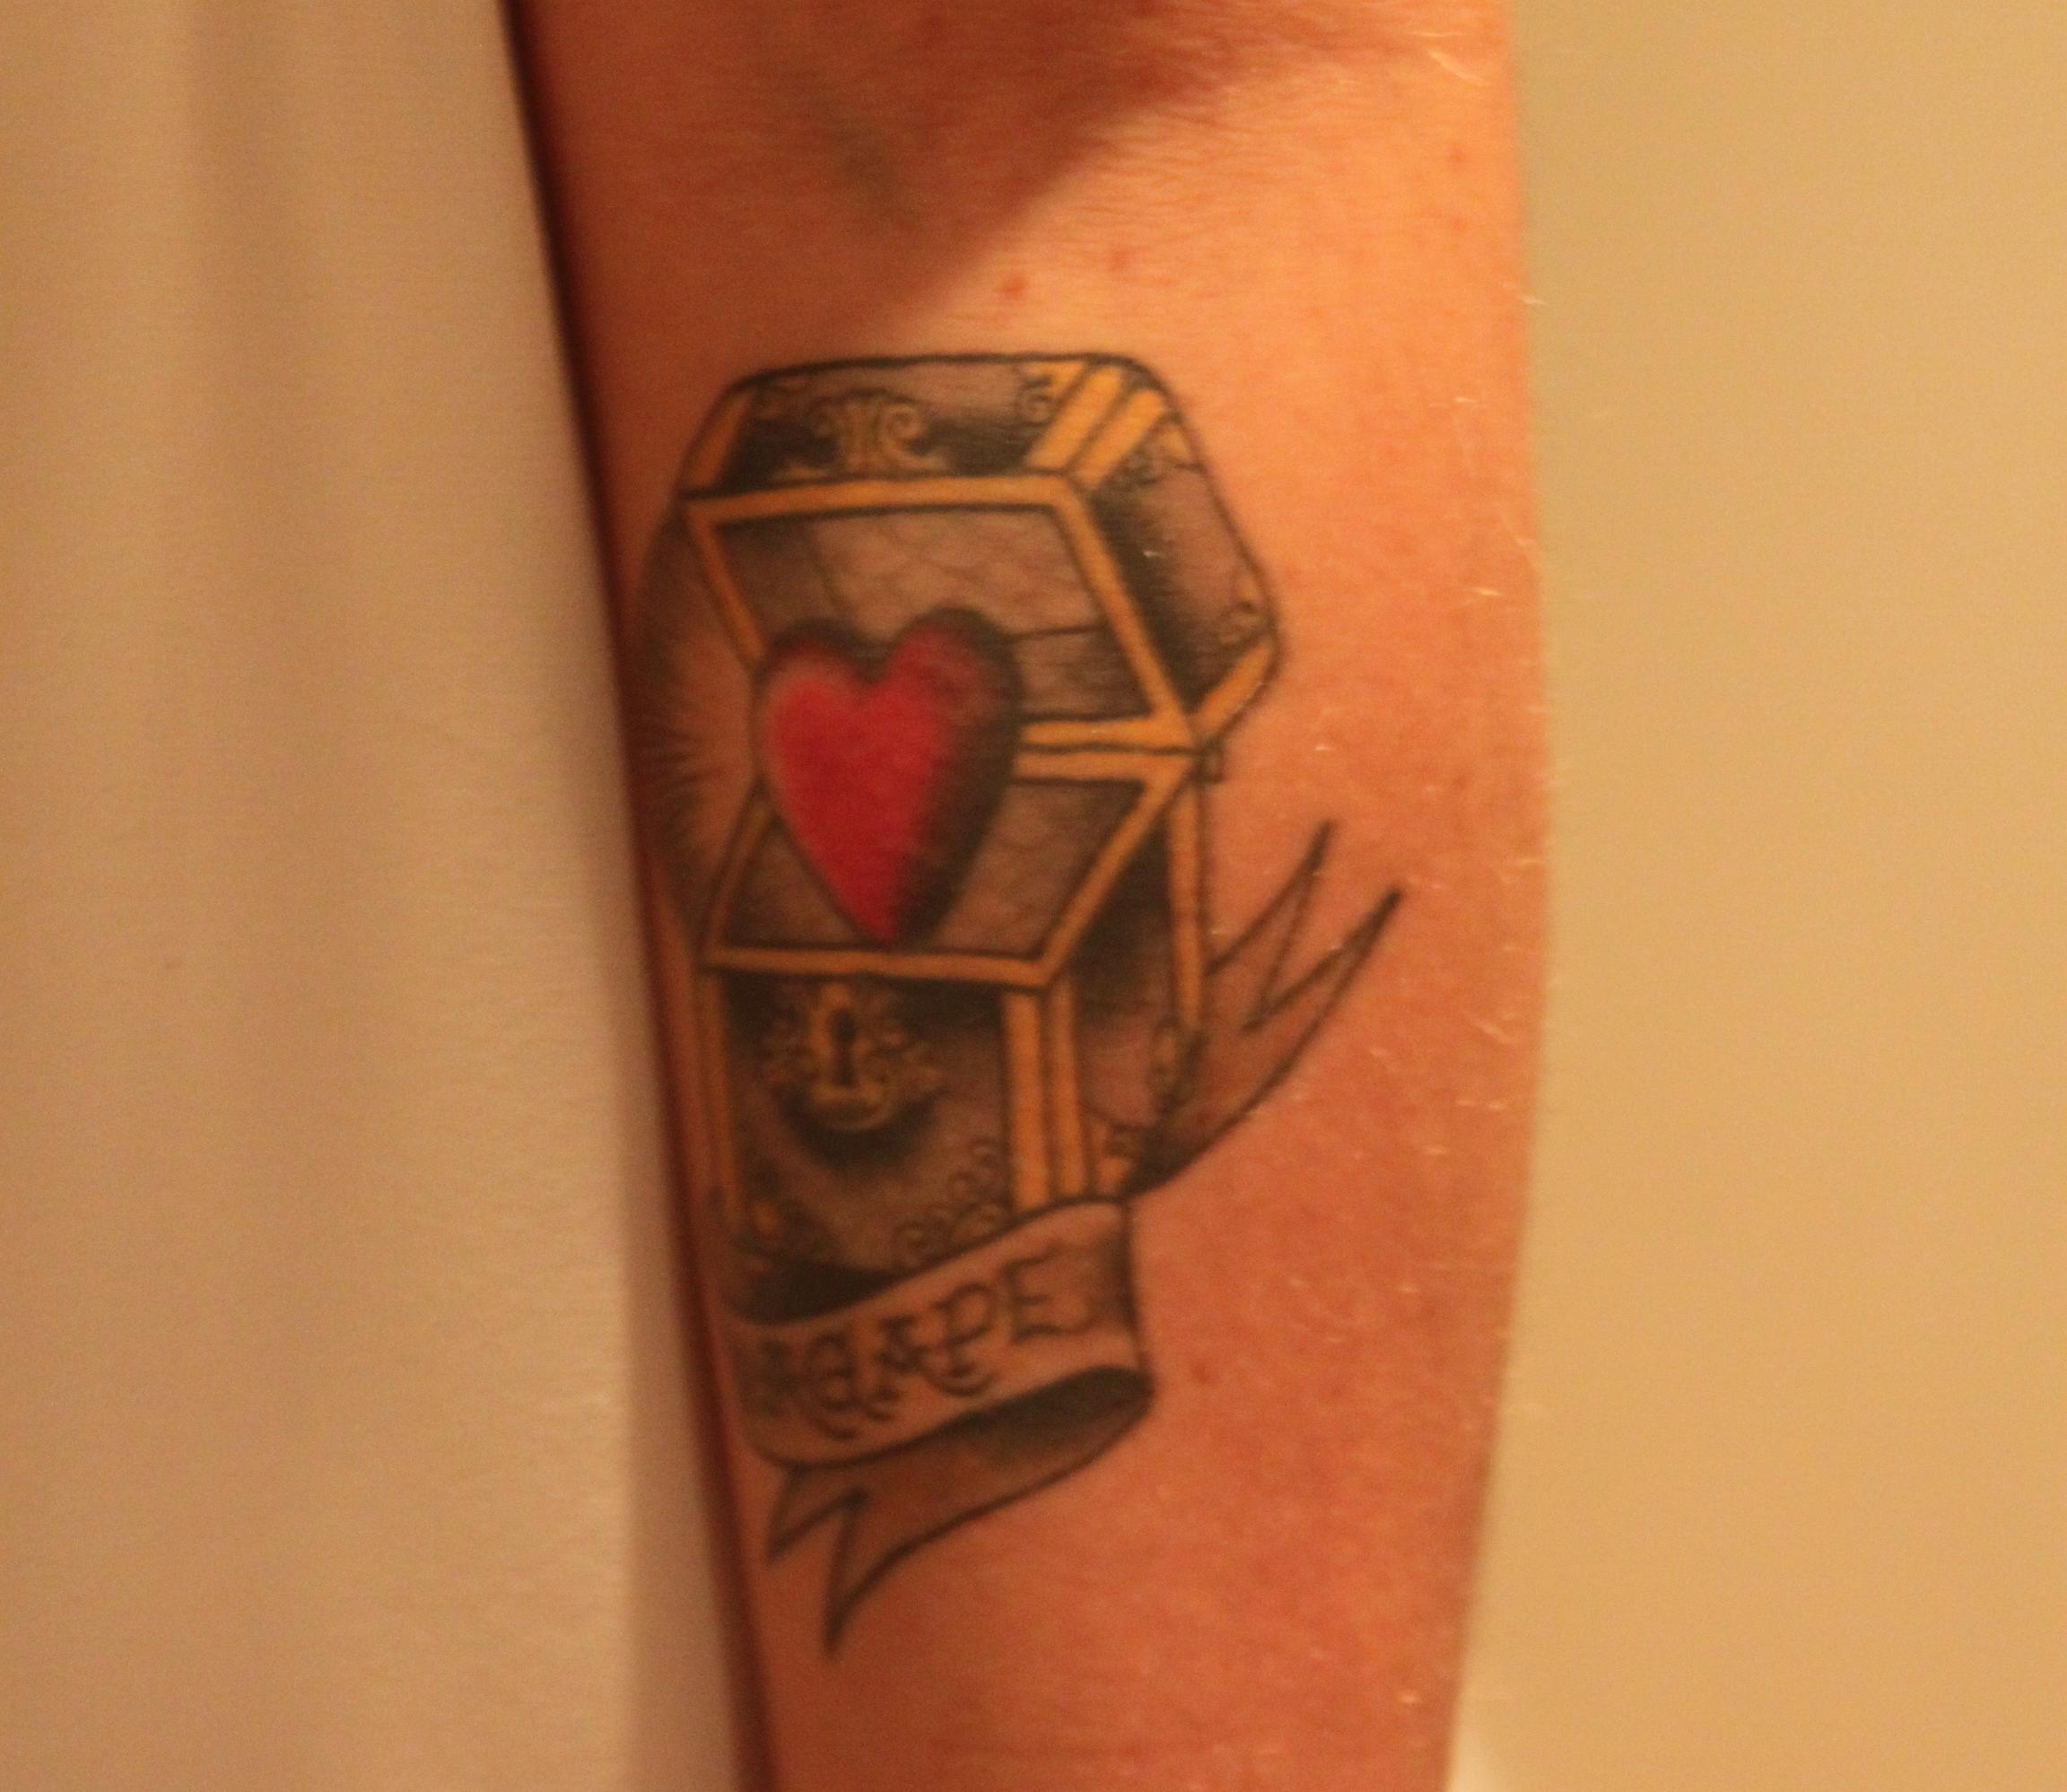 Treasure Chest Tattoo: Tattoo Inspiration